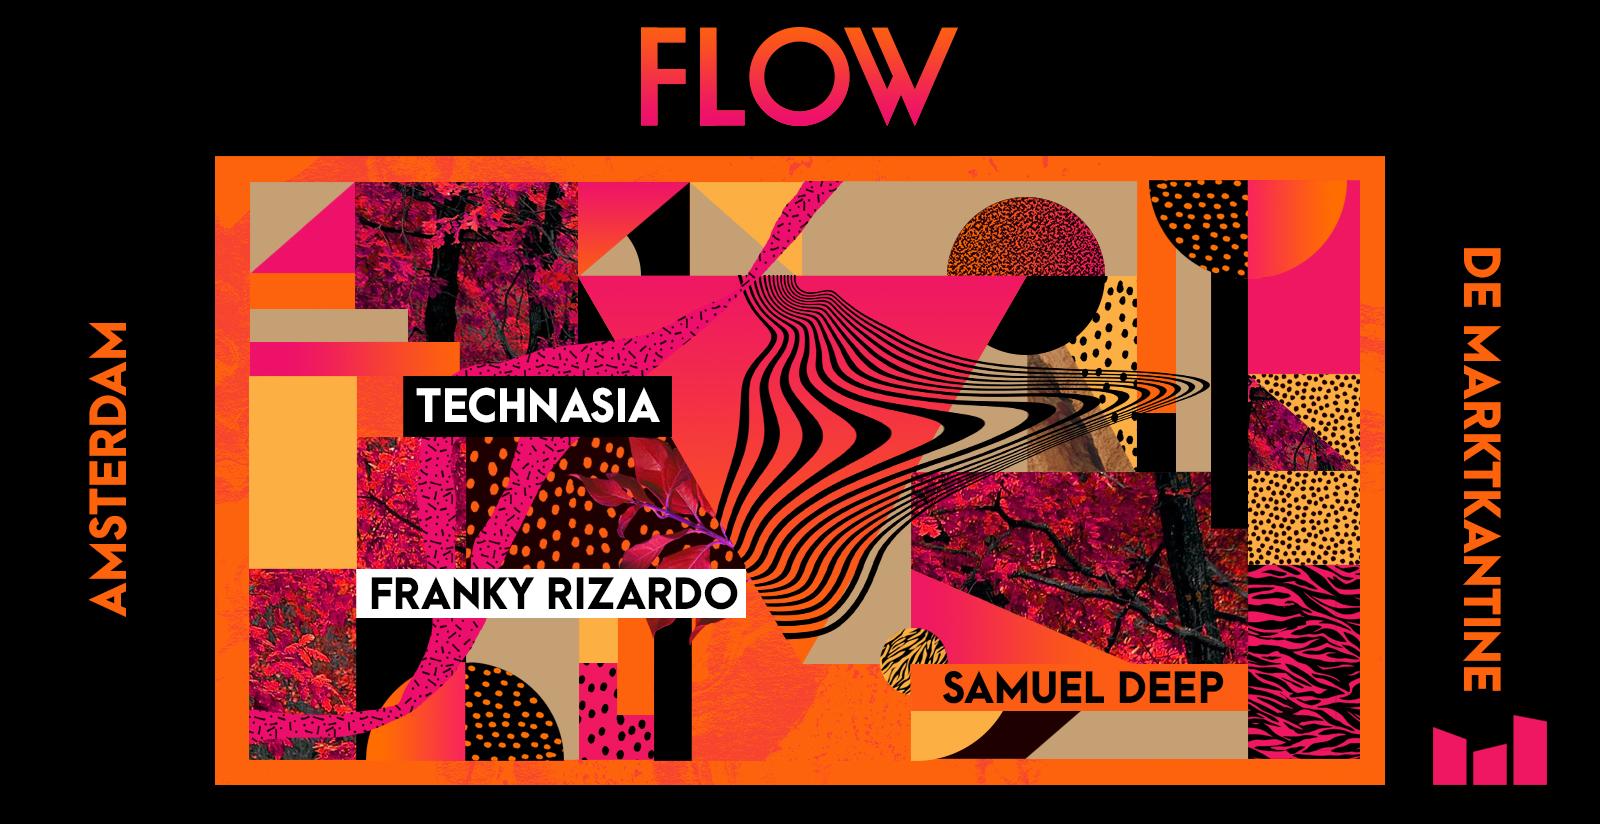 flow_2_mk_fb_event.jpg